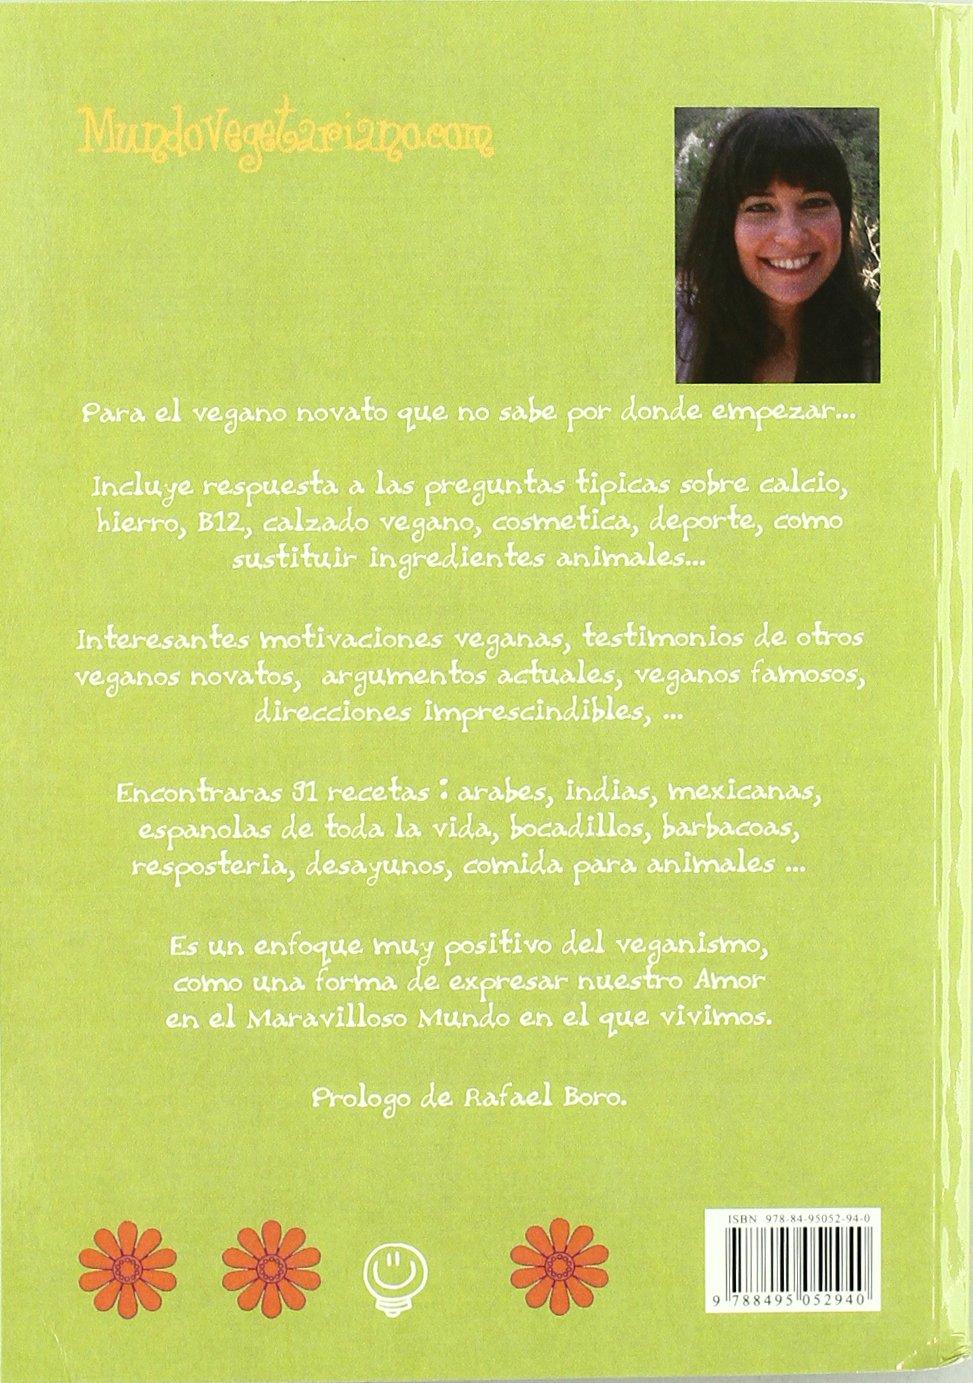 Manual De Supervivencia Para Veganos Novatos/ Survival Guide for Inexperienced Vegans (Spanish Edition): Ana Moreno: 9788495052940: Amazon.com: Books